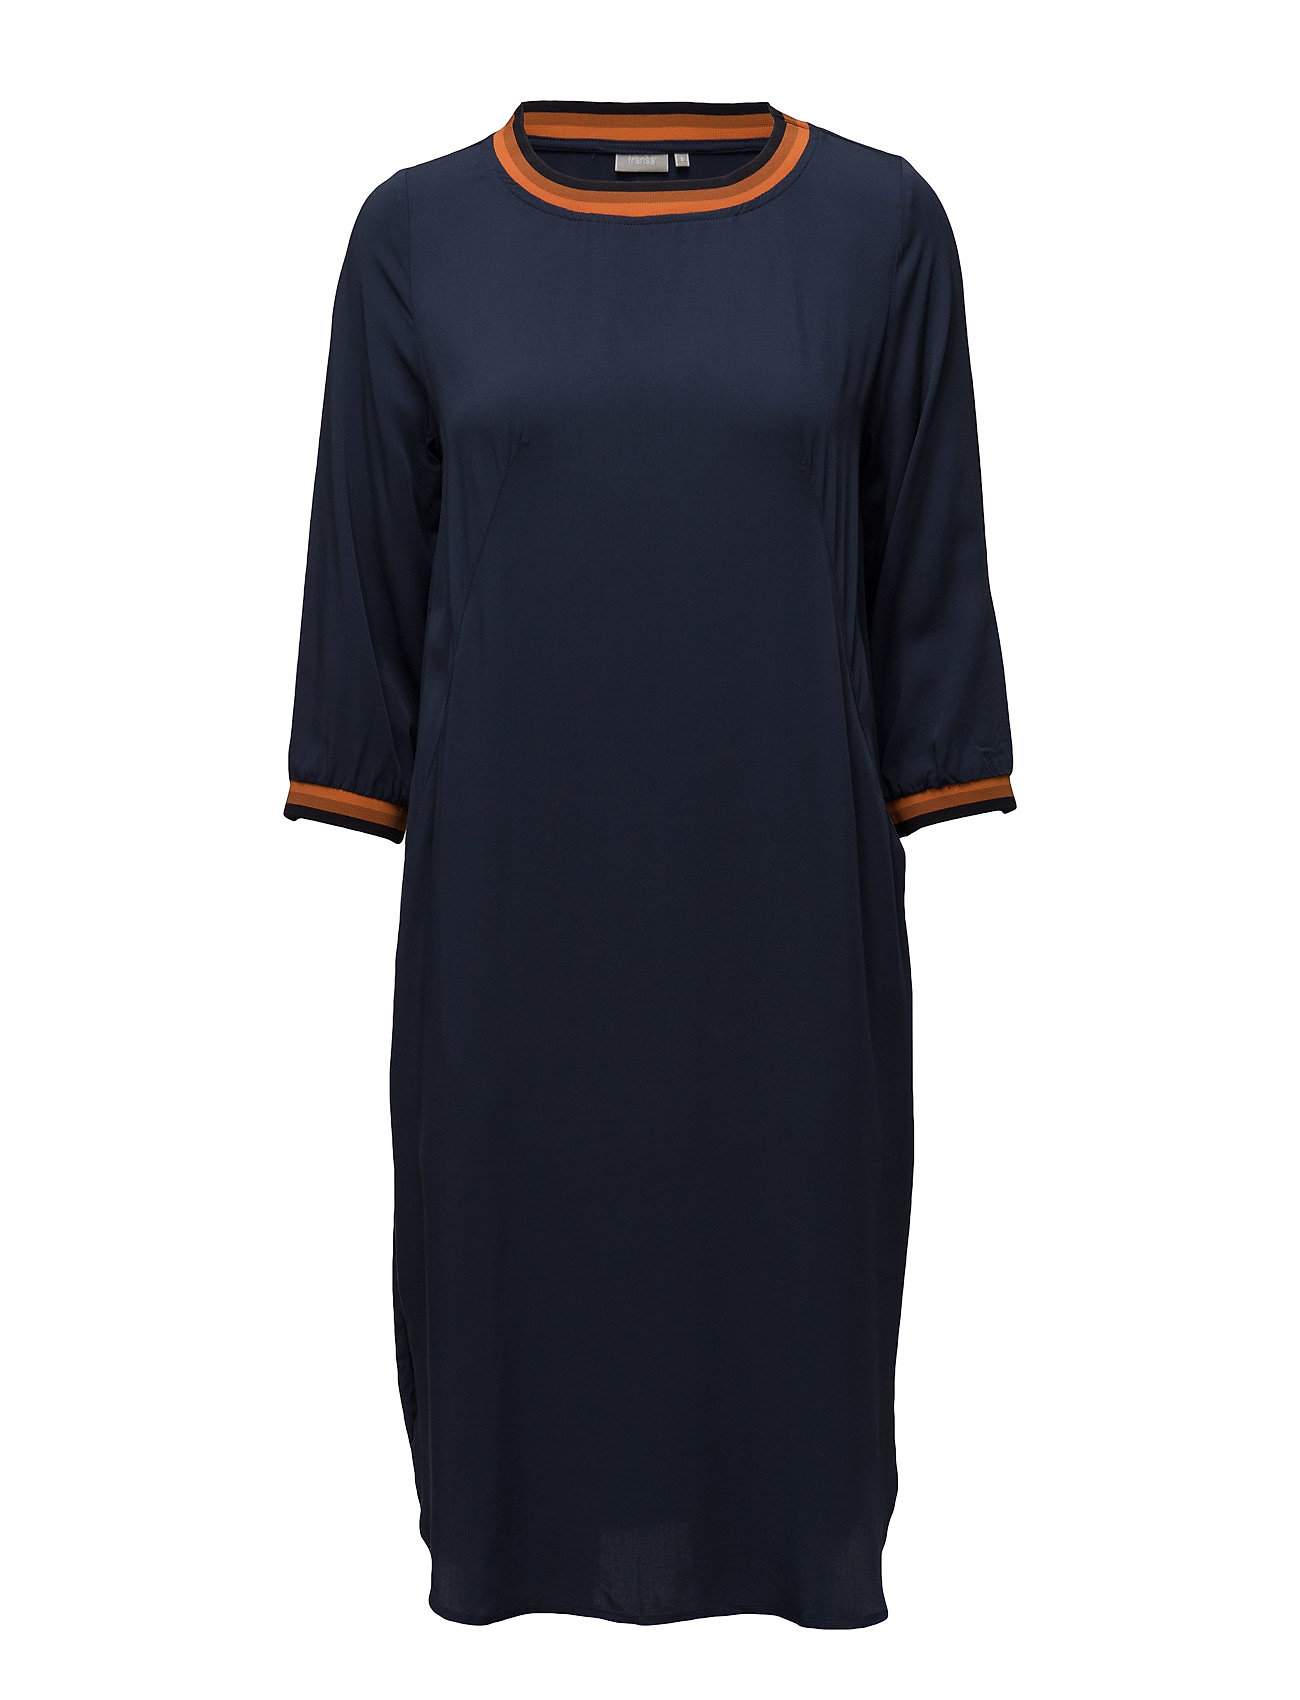 Jylife 1 Dress Fransa Dresses thumbnail